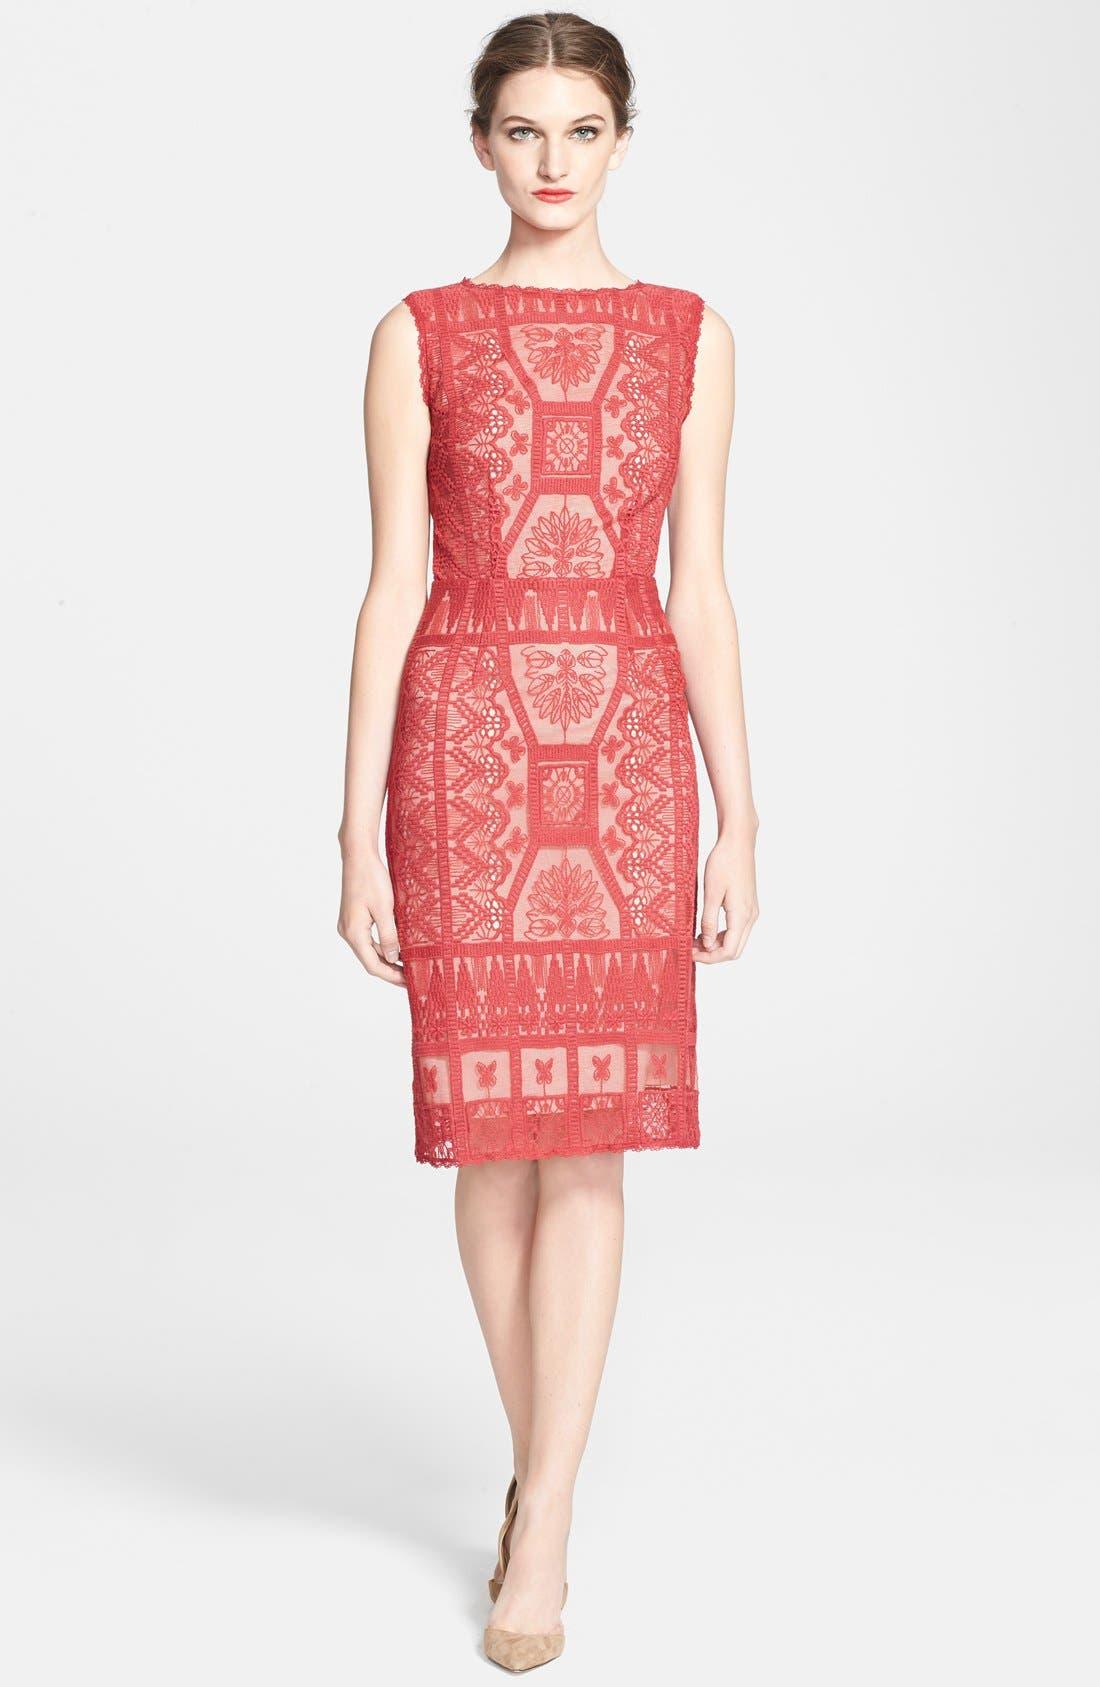 Alternate Image 1 Selected - Korovilas 'Estella' Embroidered Lace Sheath Dress